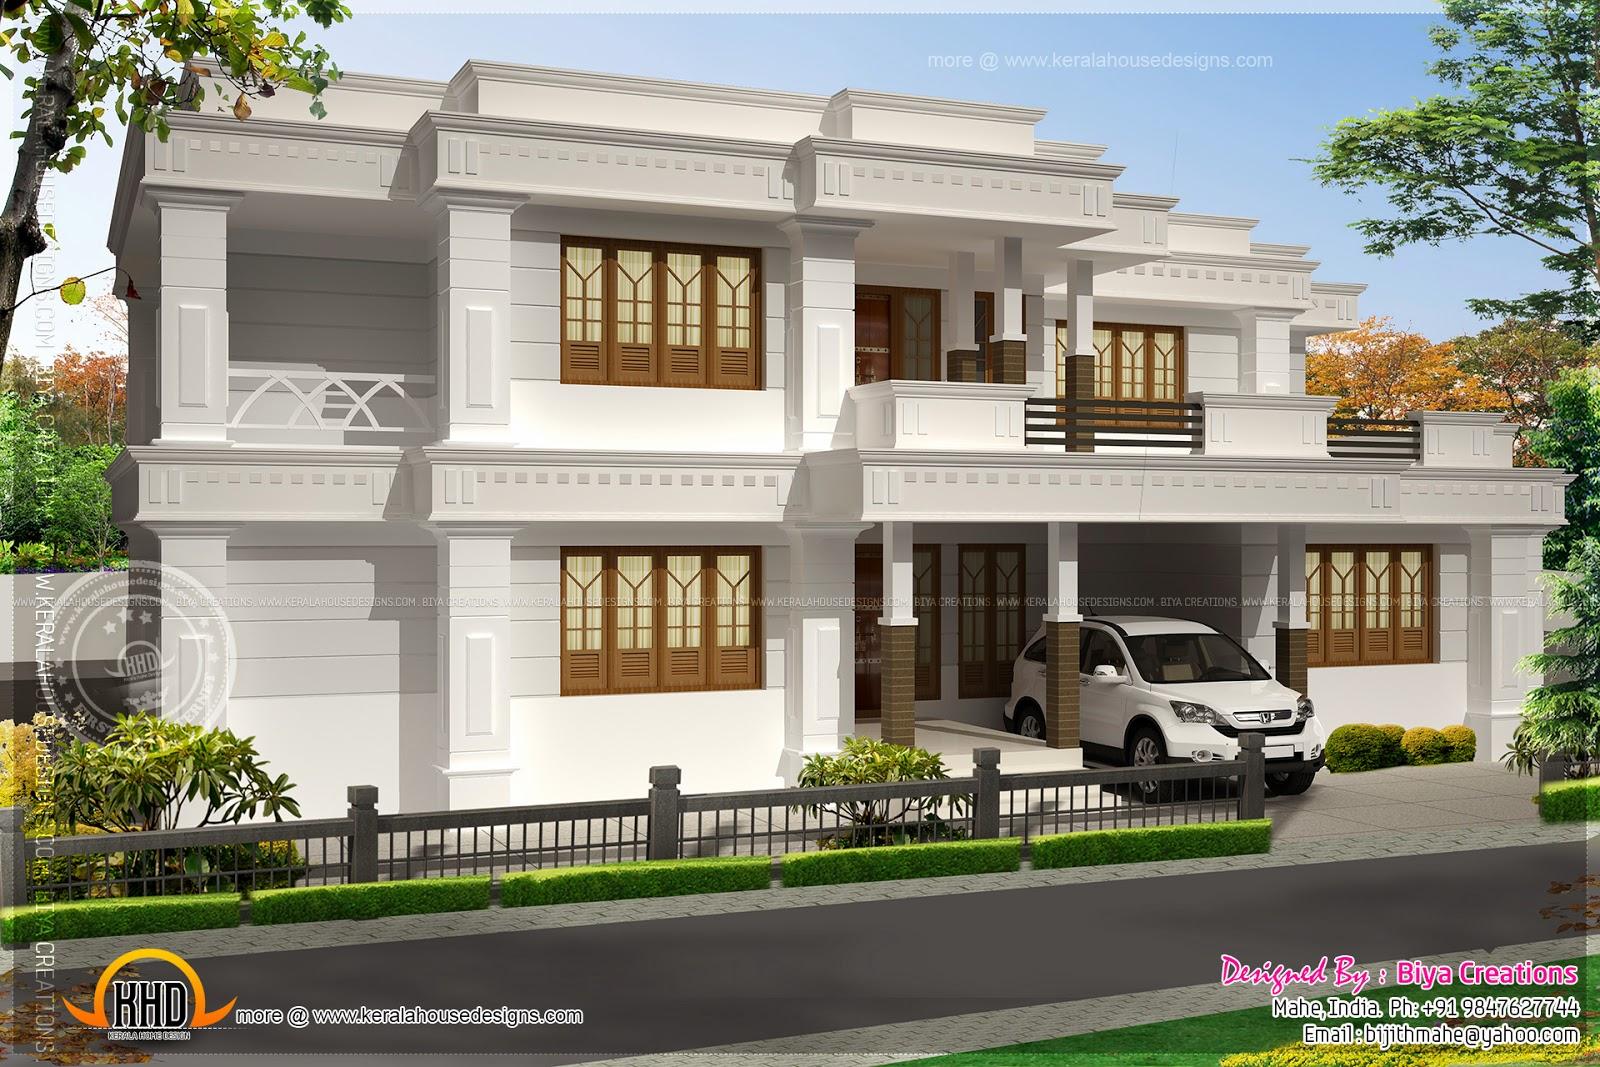 House Plans: Nice modern house exterior